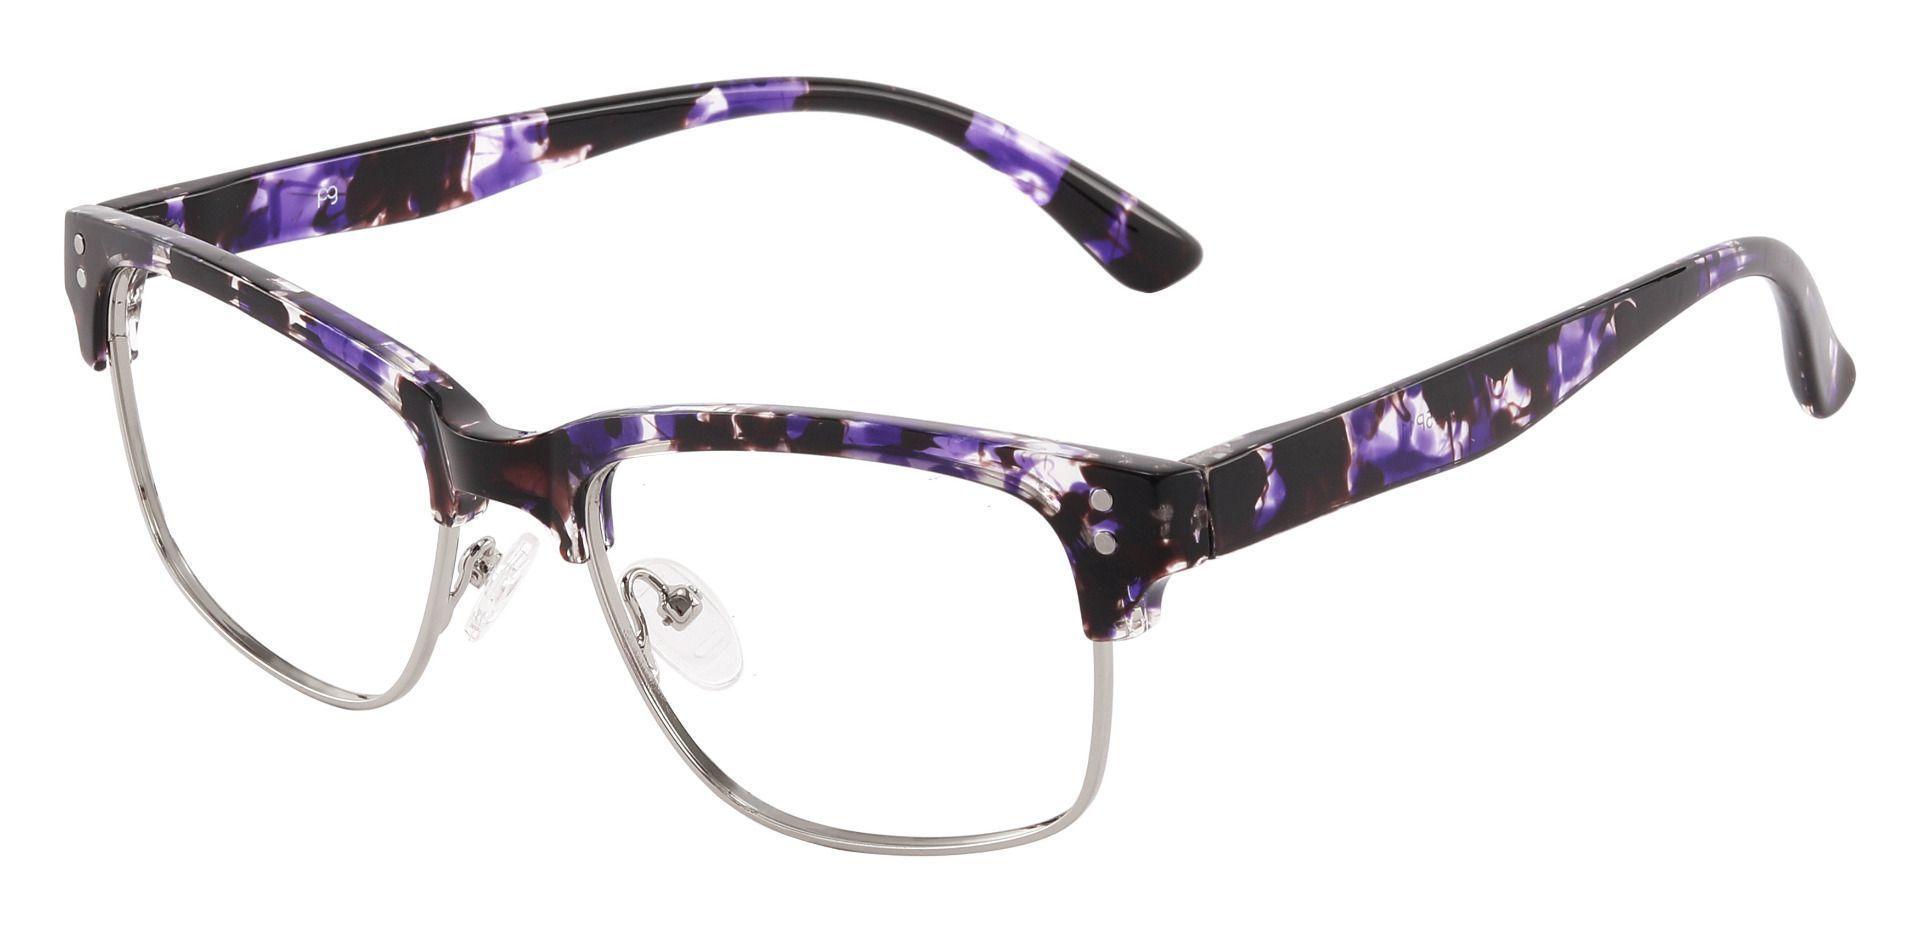 Burnett Browline Prescription Glasses - Purple